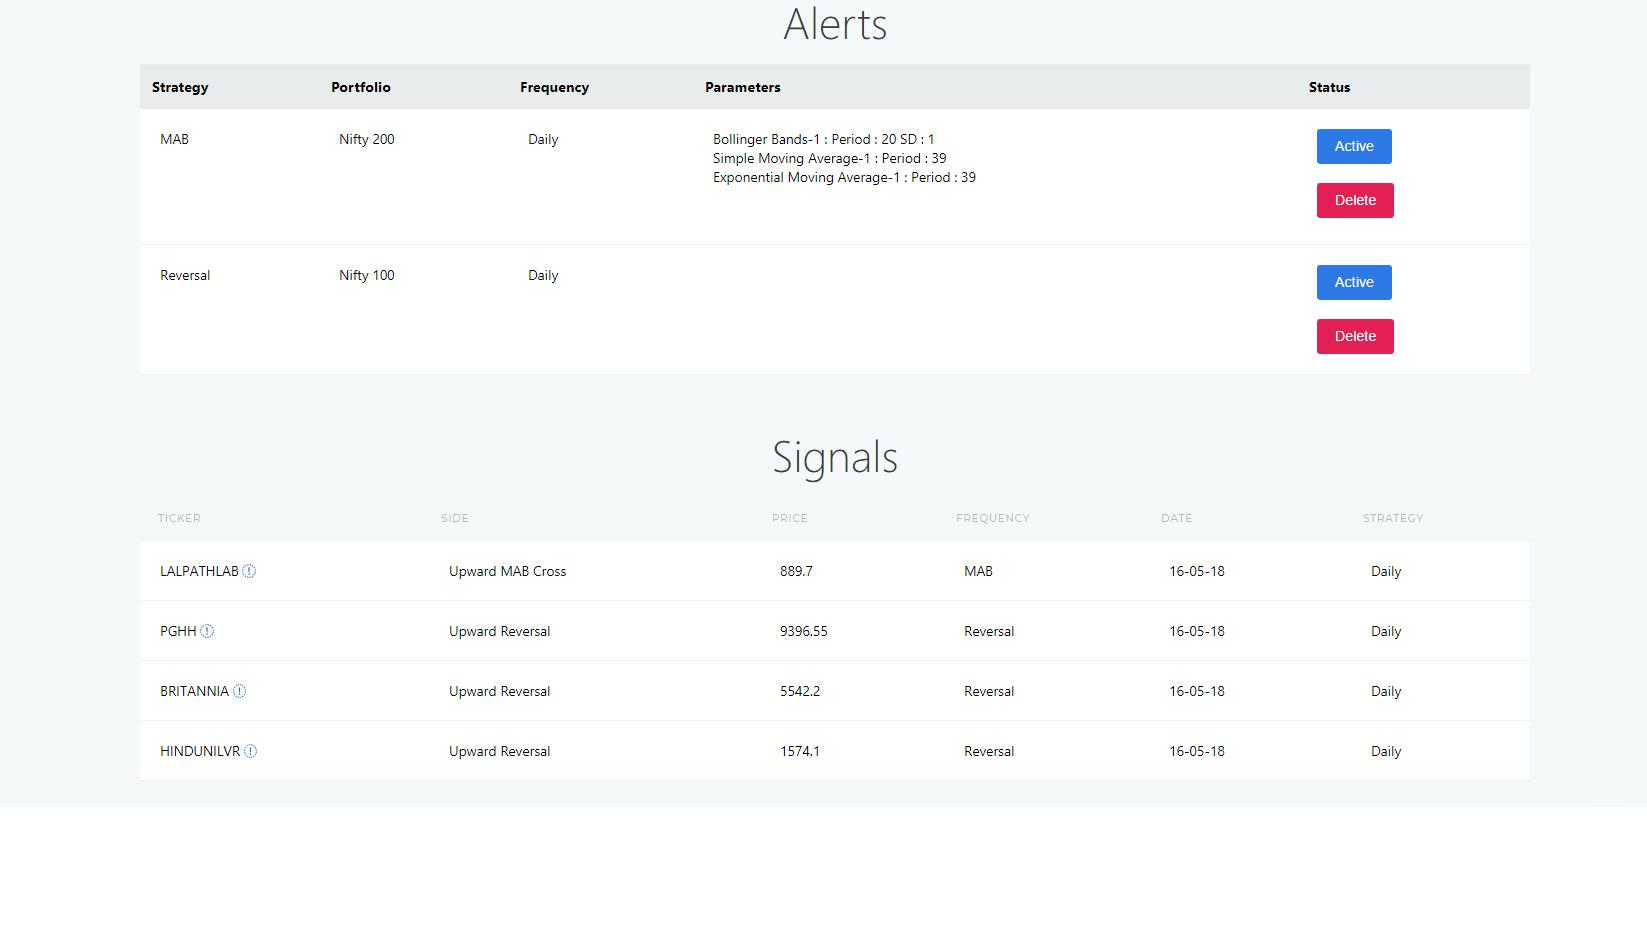 Tradestream in - Chart Scanner and Portfolio Tracker